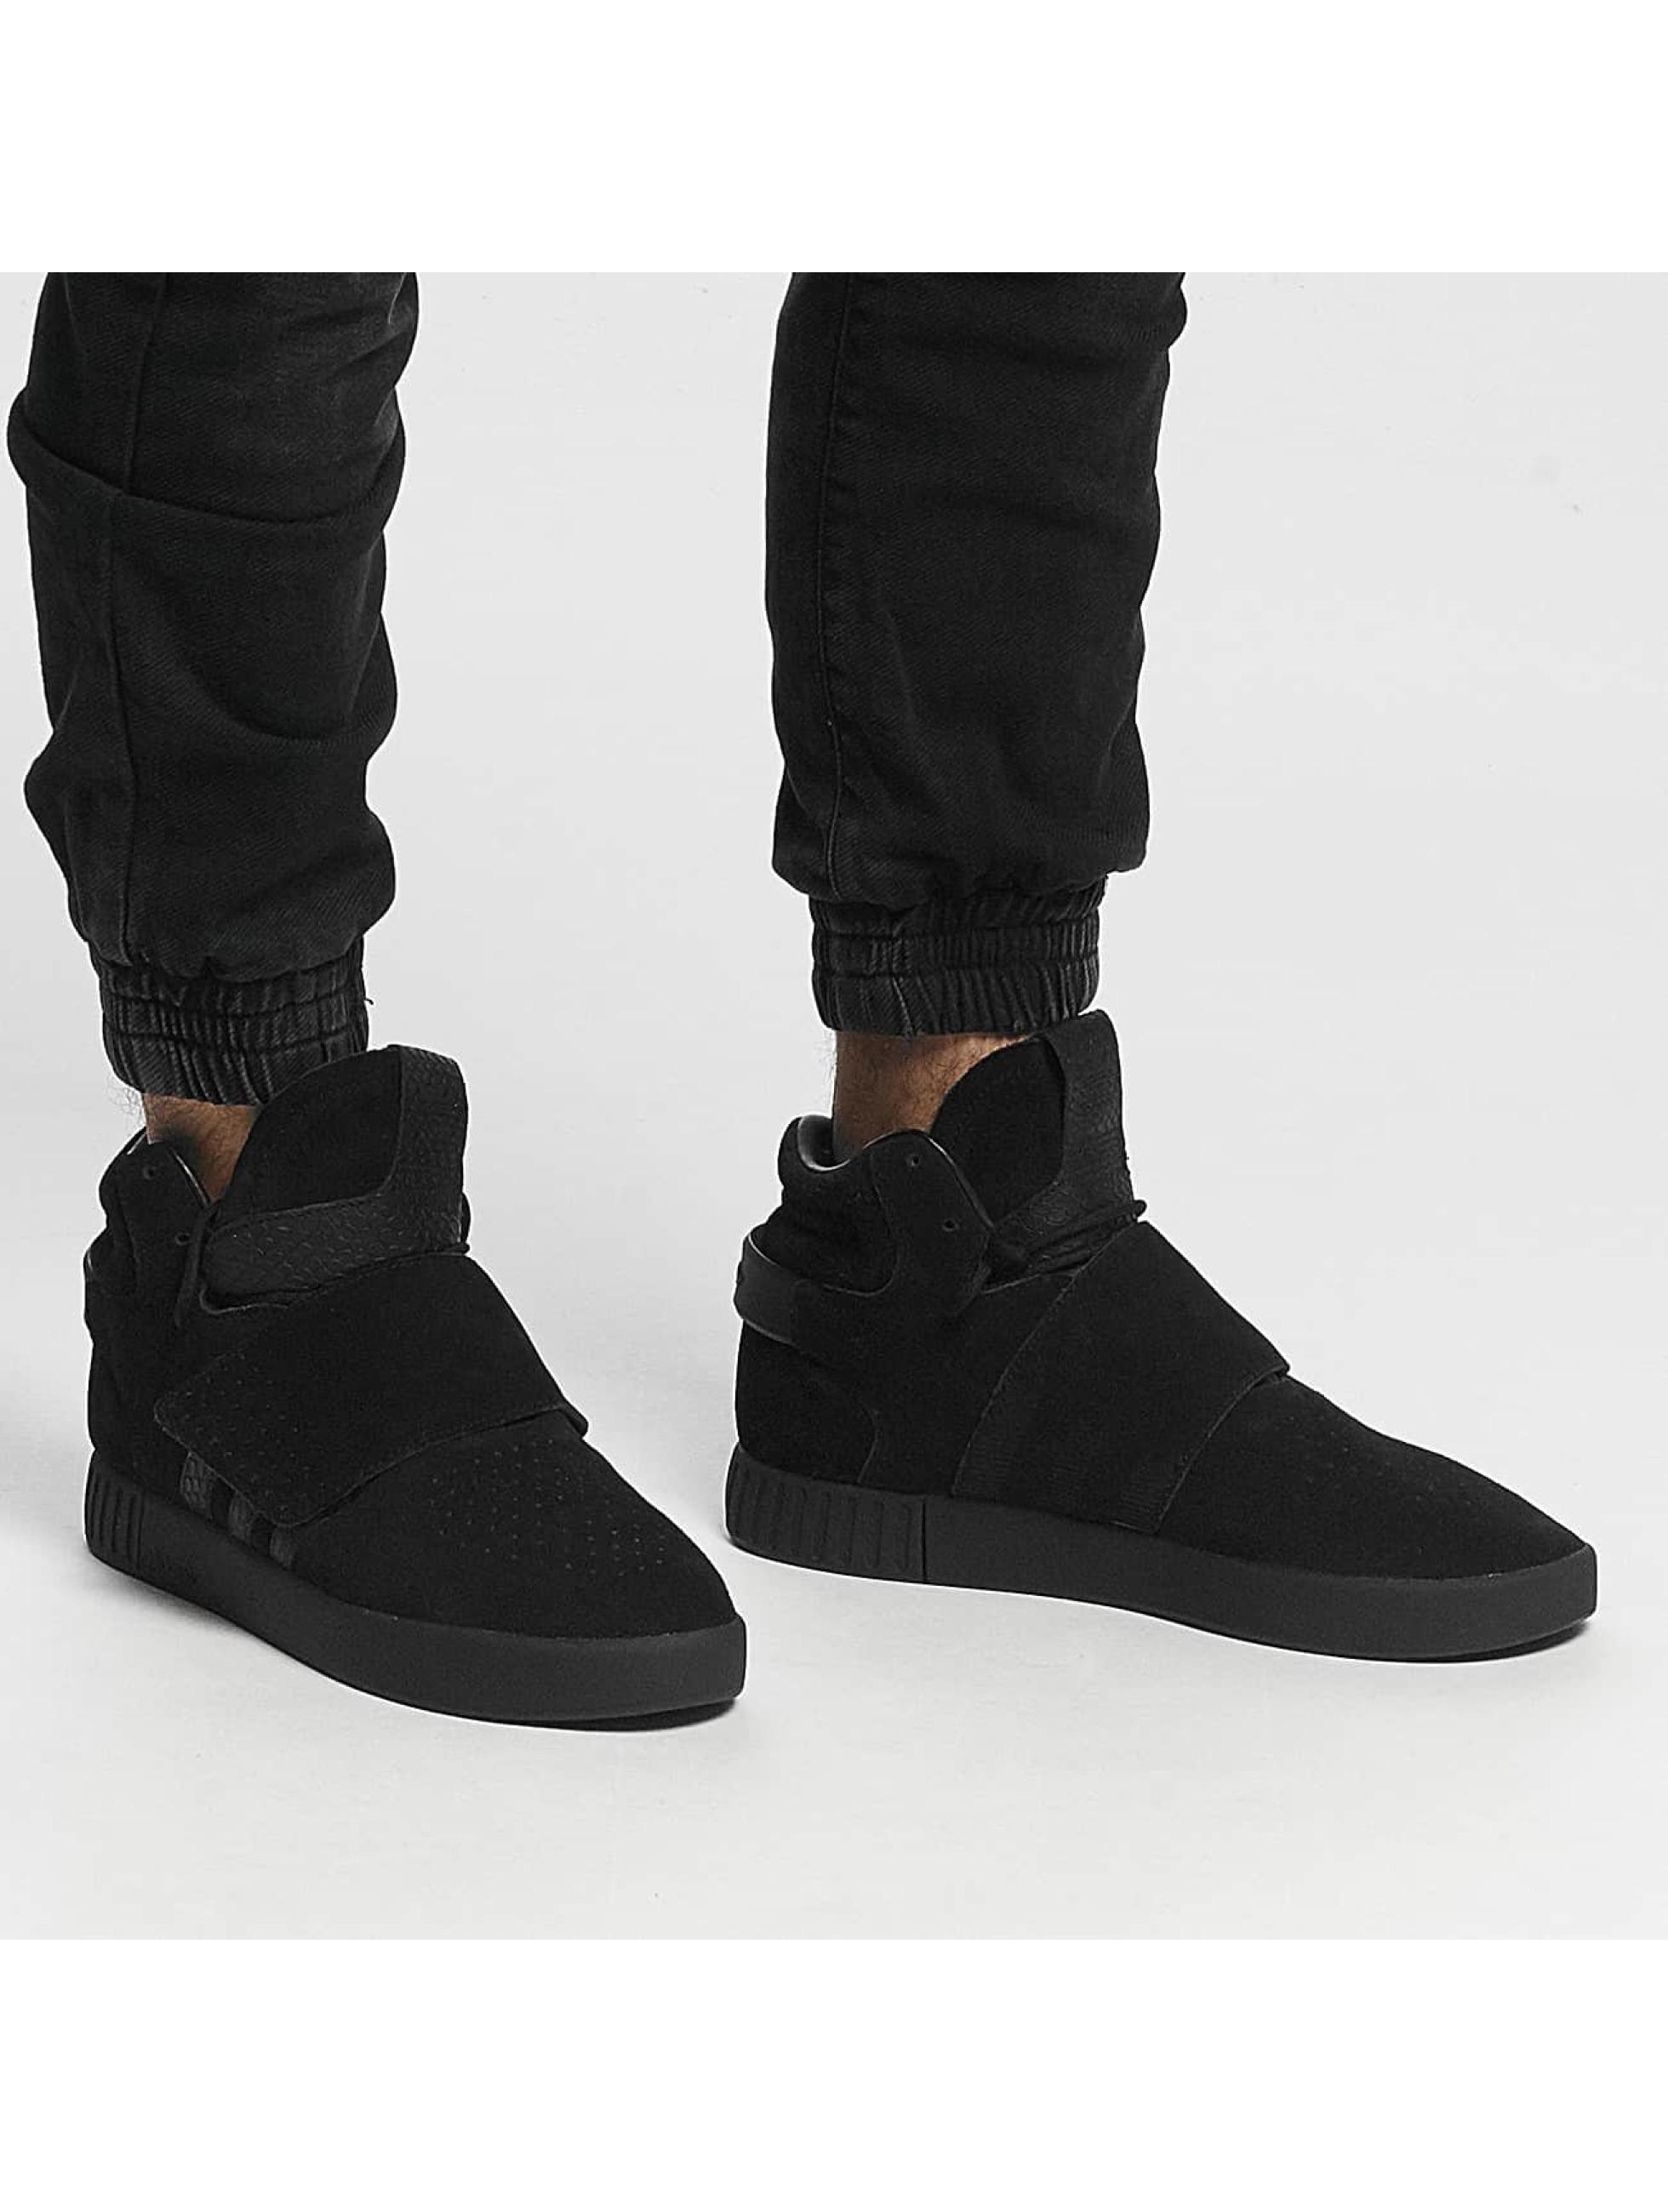 adidas Sneakers Tubular Invader black